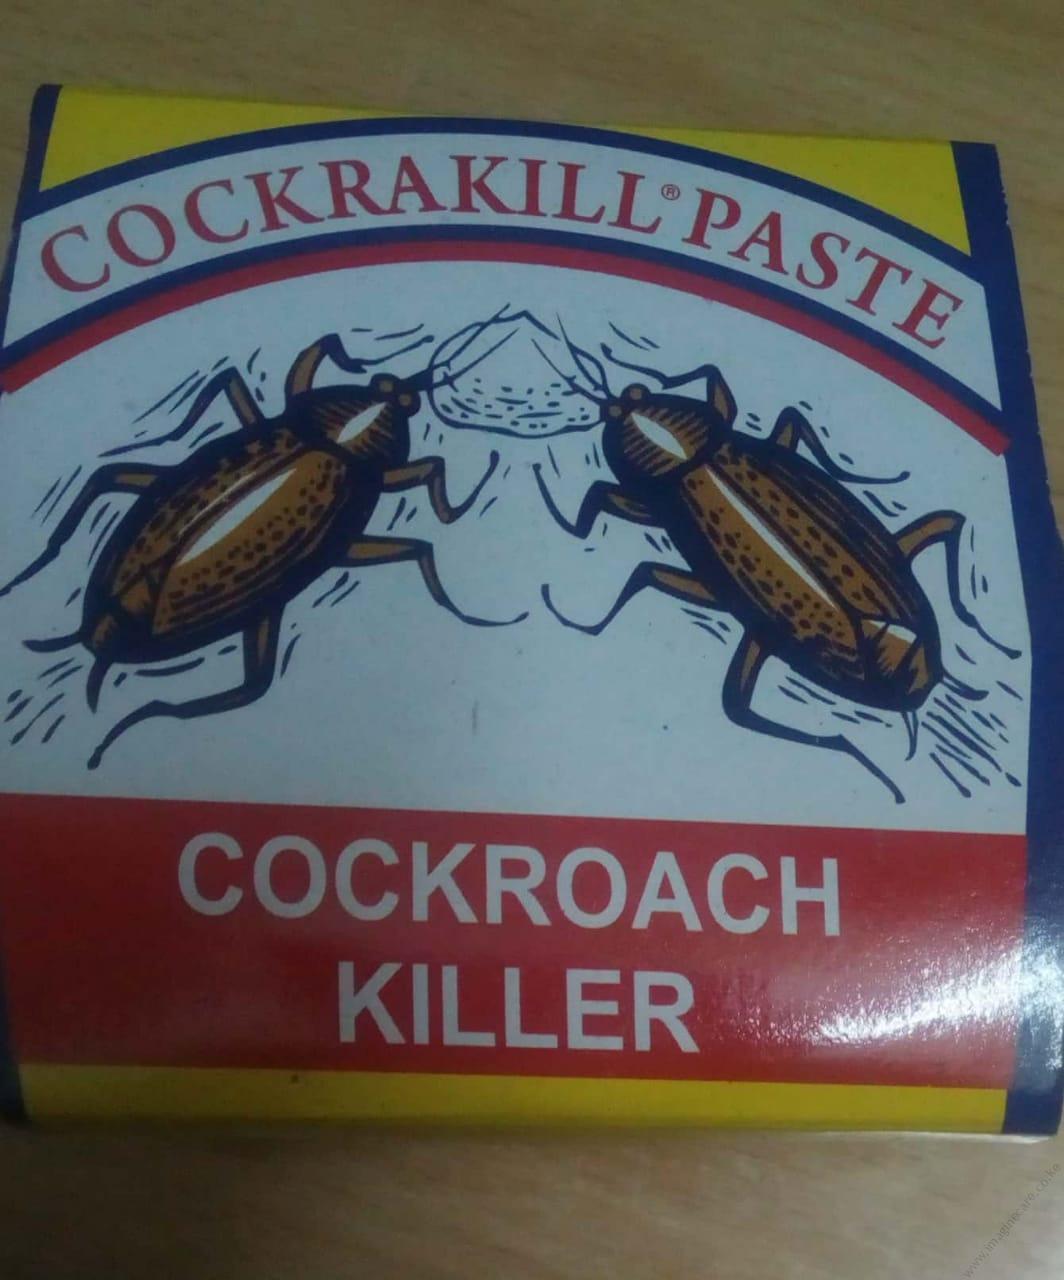 shop Cockrakill Paste